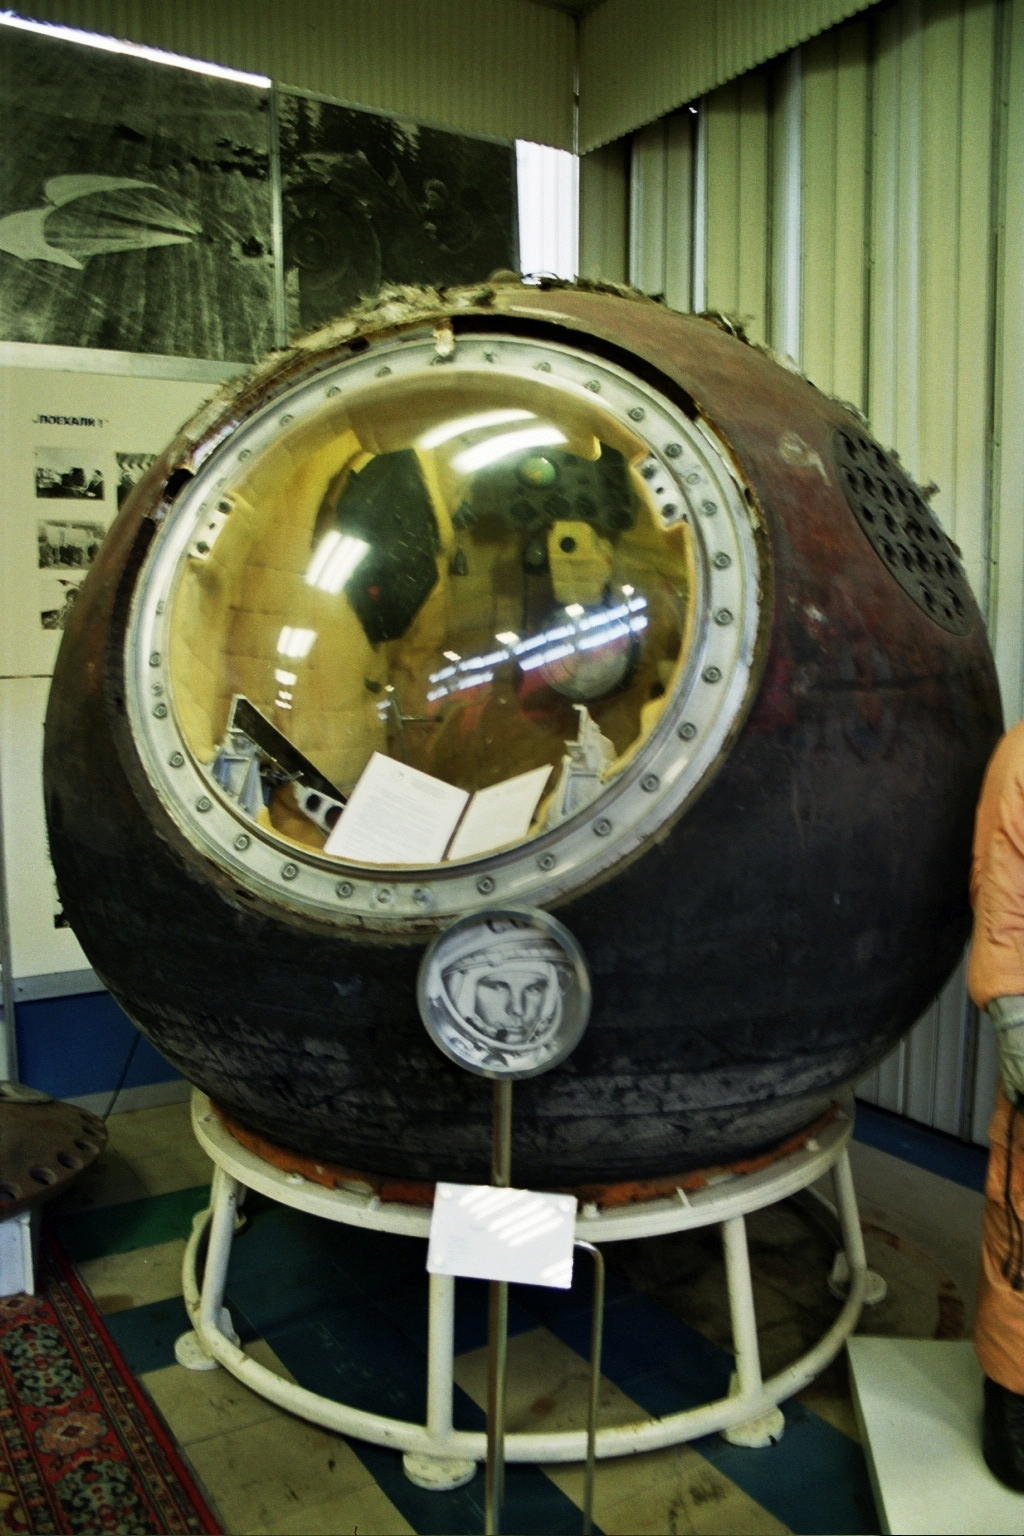 vostok - L'horloge du Vostok Vostok17